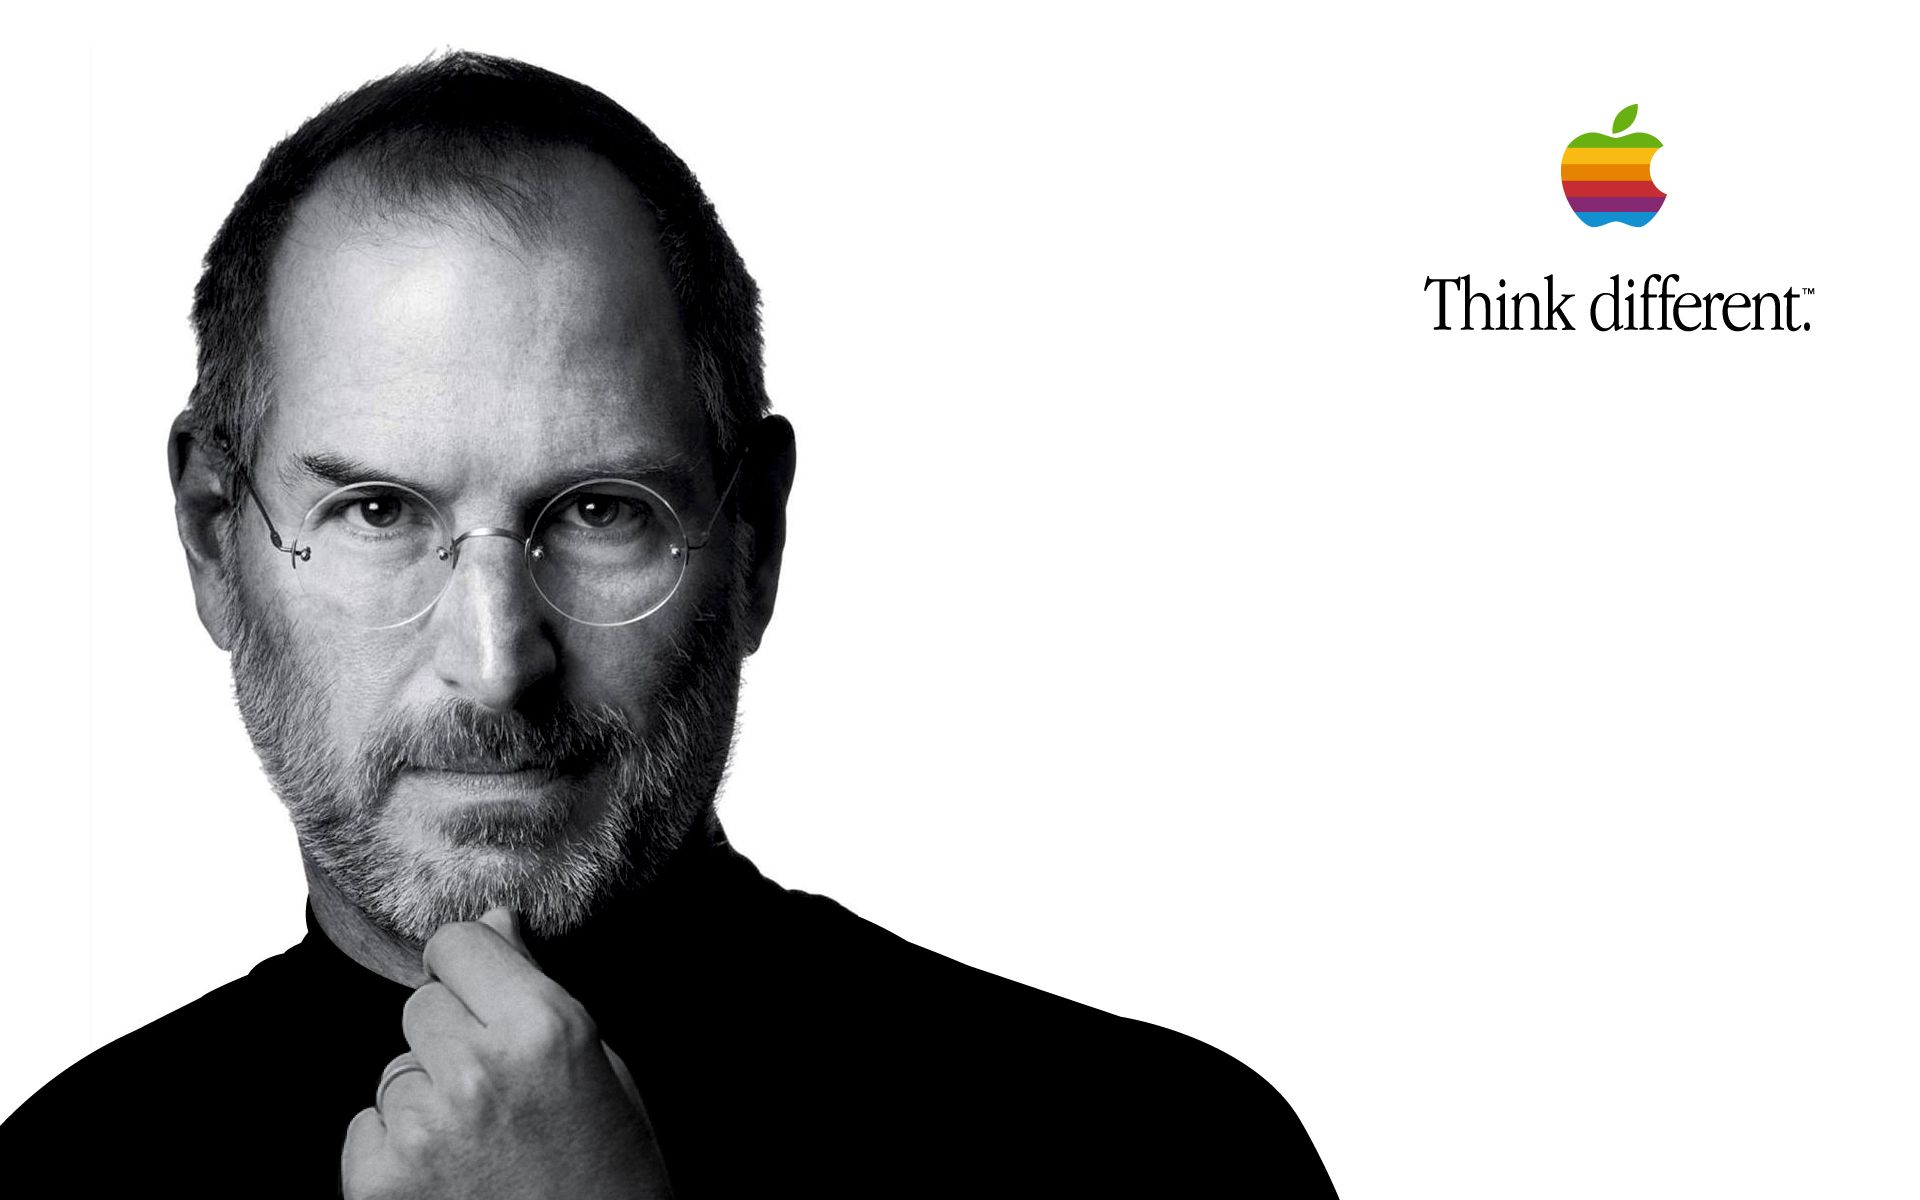 Steve Jobs - Think Different by ~chrisdata on deviantART HD Wallpaper | Think Different ...